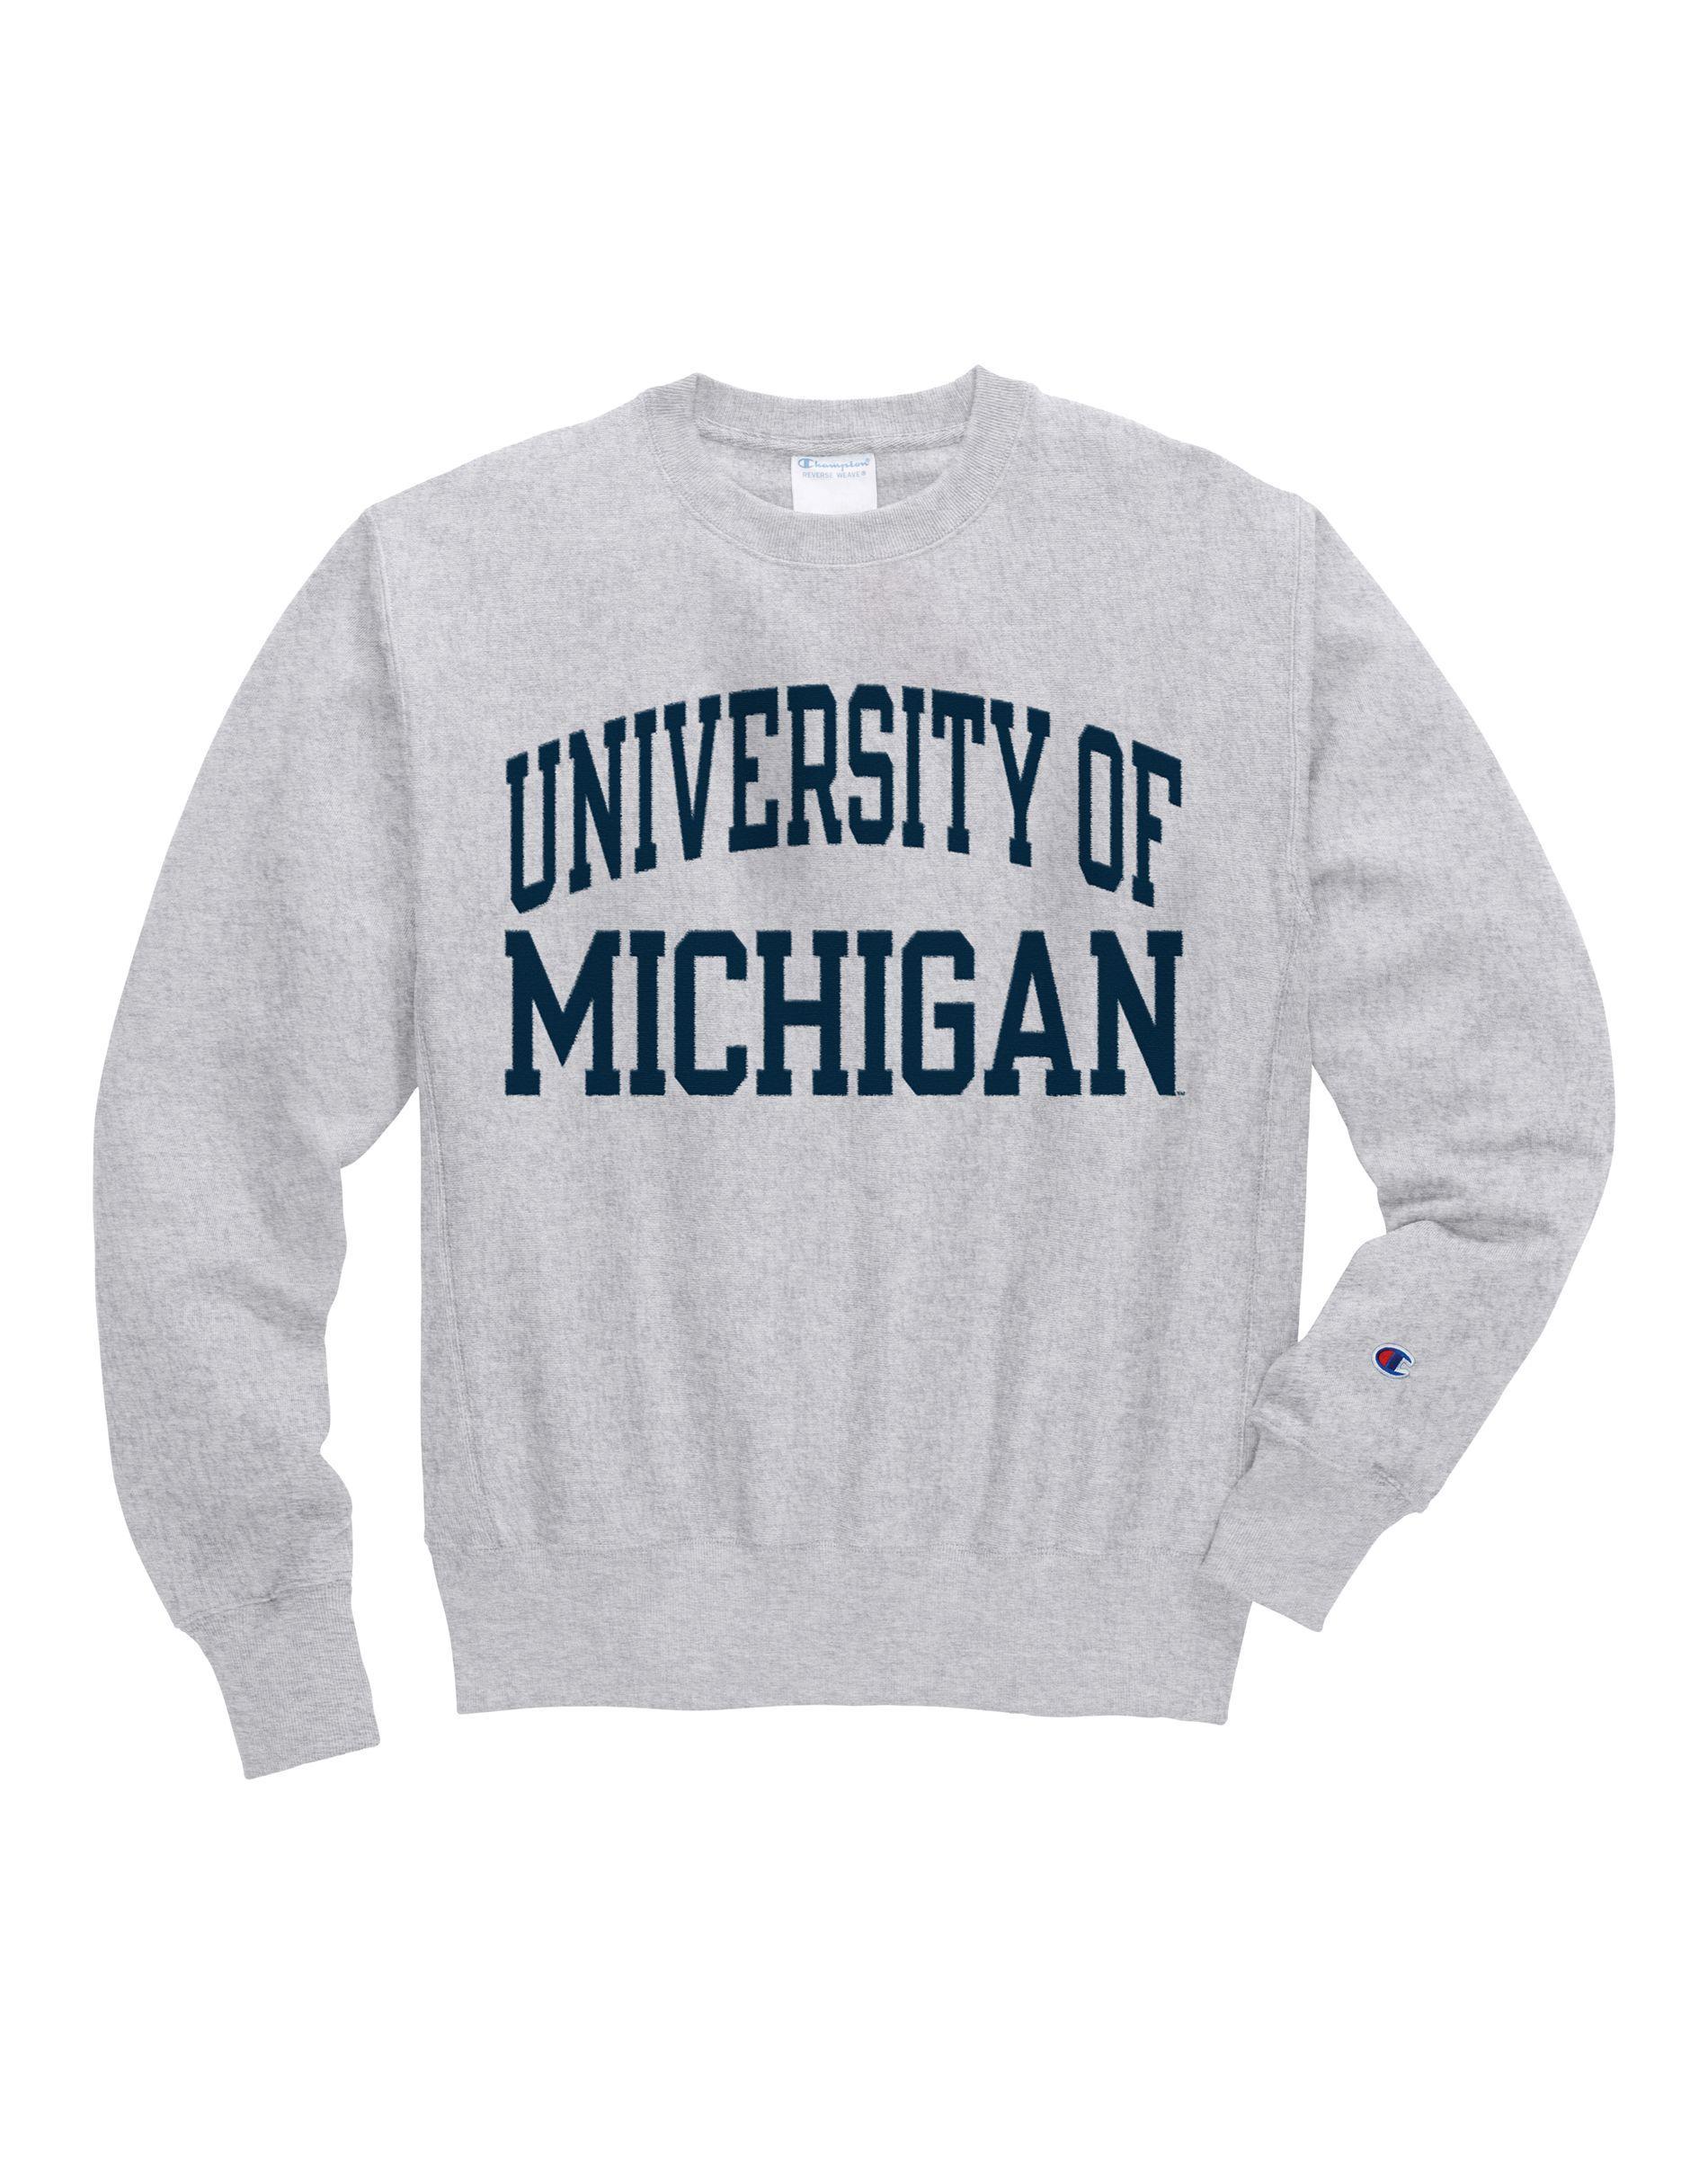 5601e266 Champion. Men's Gray Life® Reverse Weave® Ncaa Michigan Wolverines  Sweatshirt